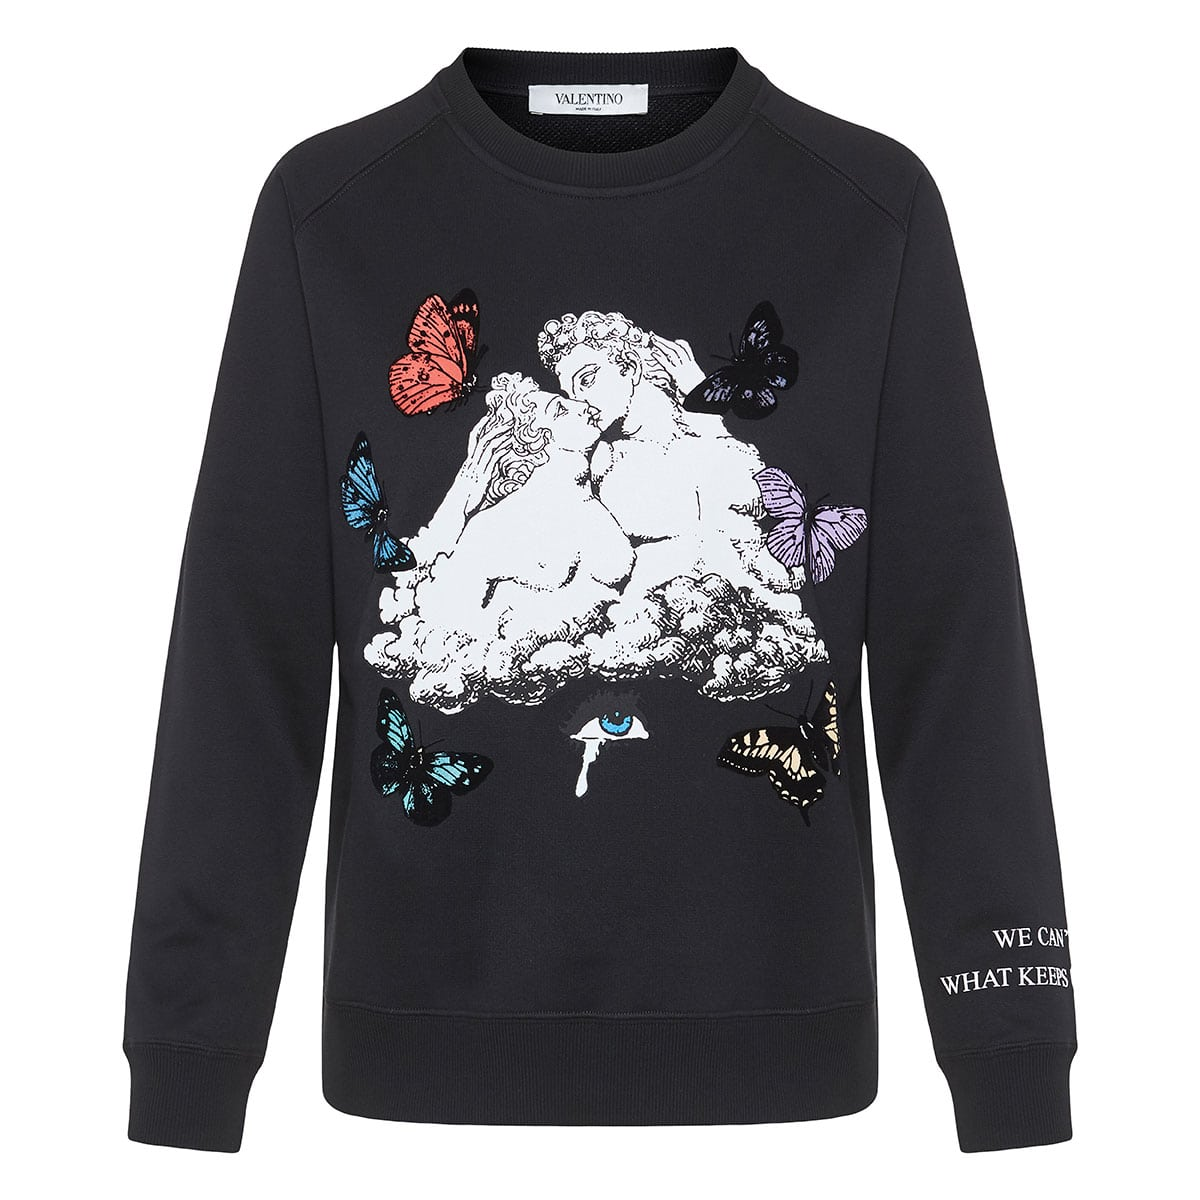 x Undercover printed cotton sweatshirt